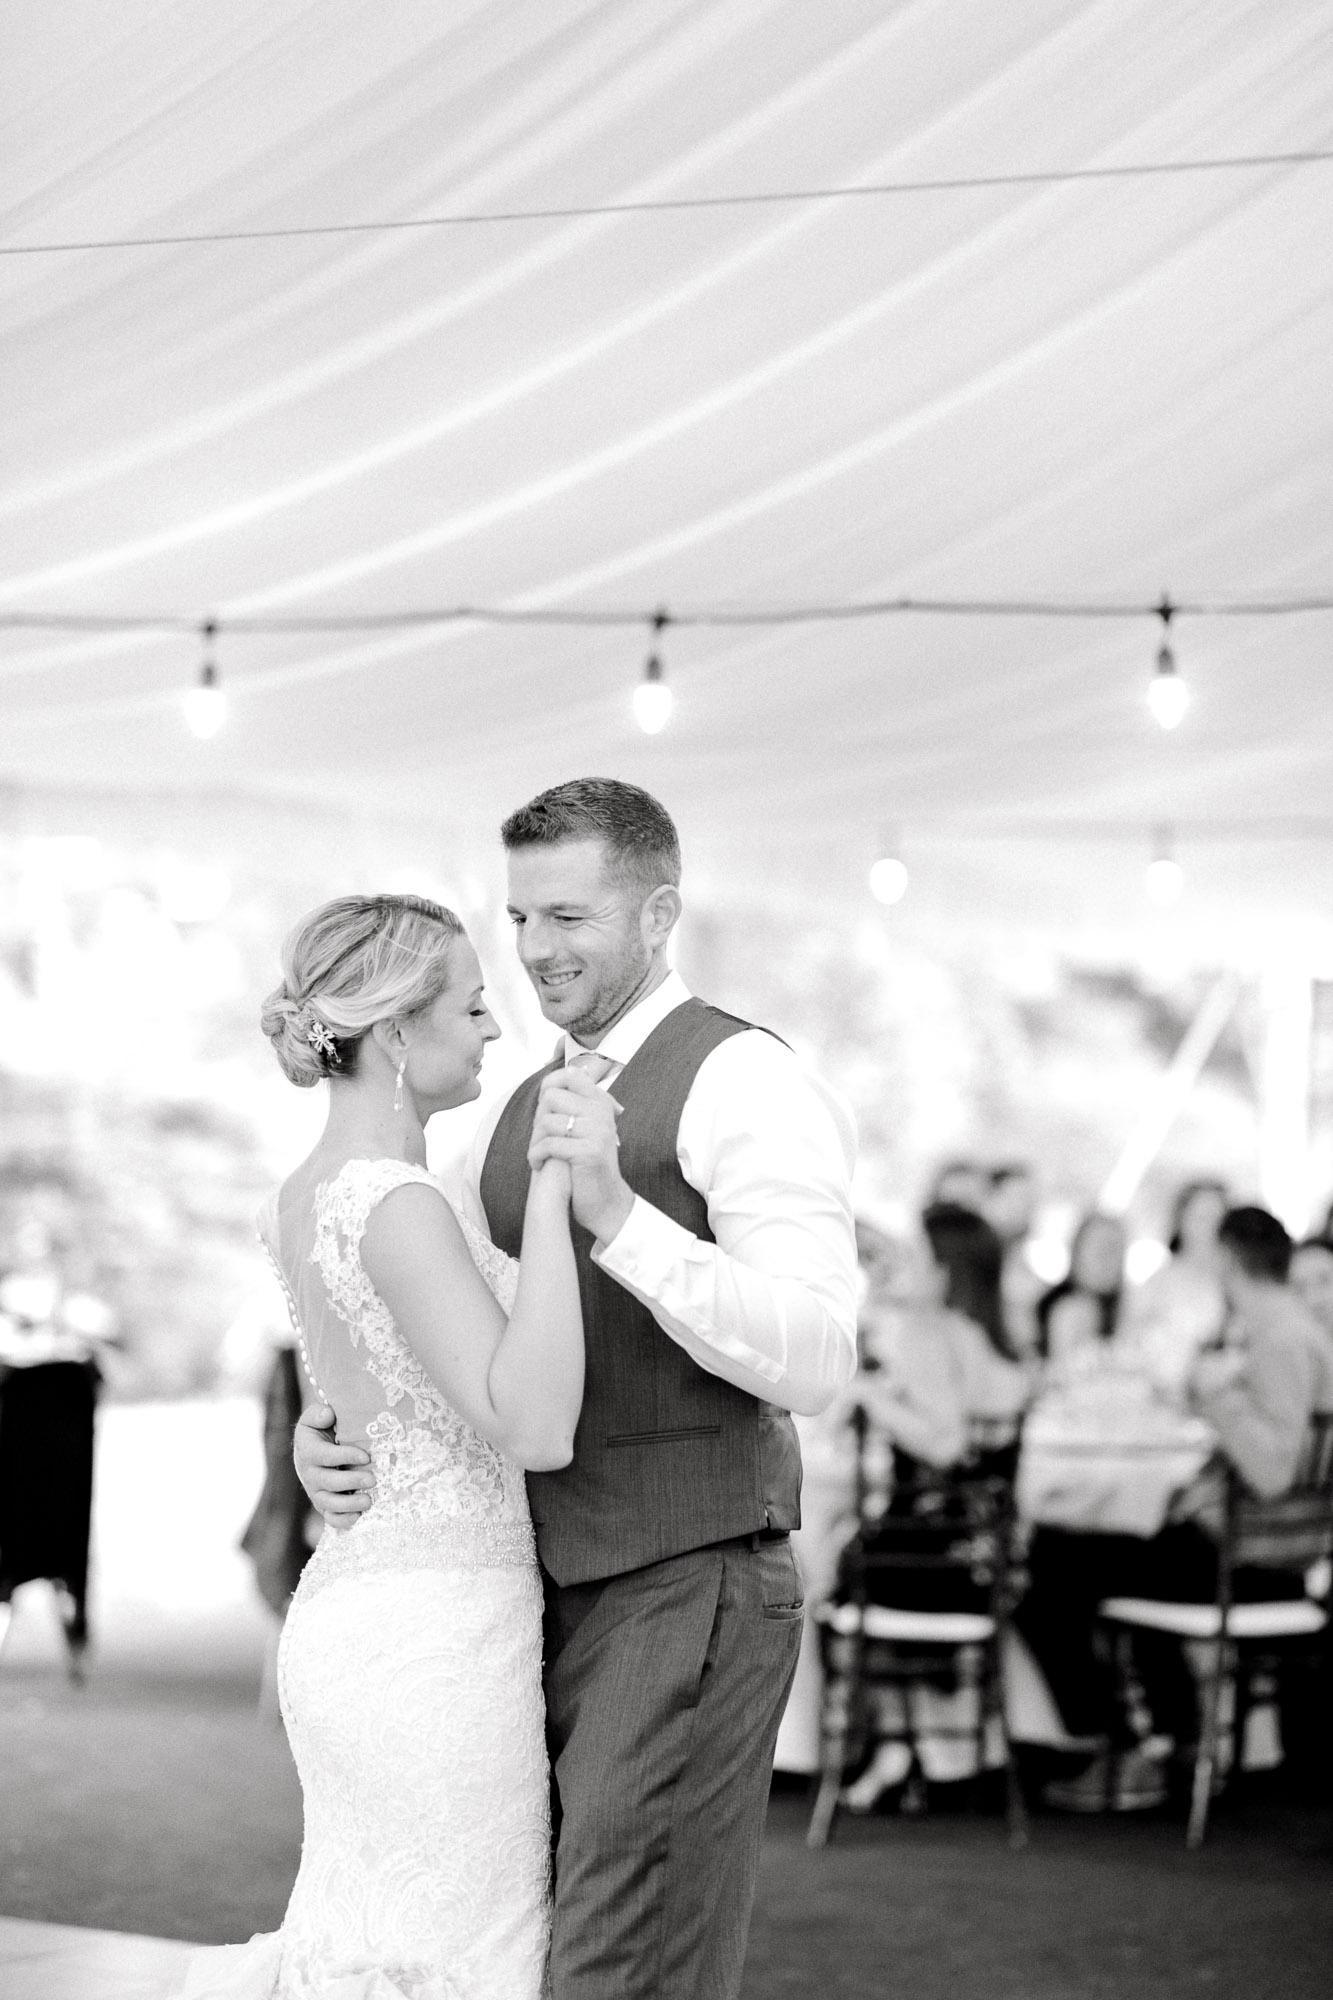 Allenberry-resort-historic-pennsylvania-wedding-22422.jpg